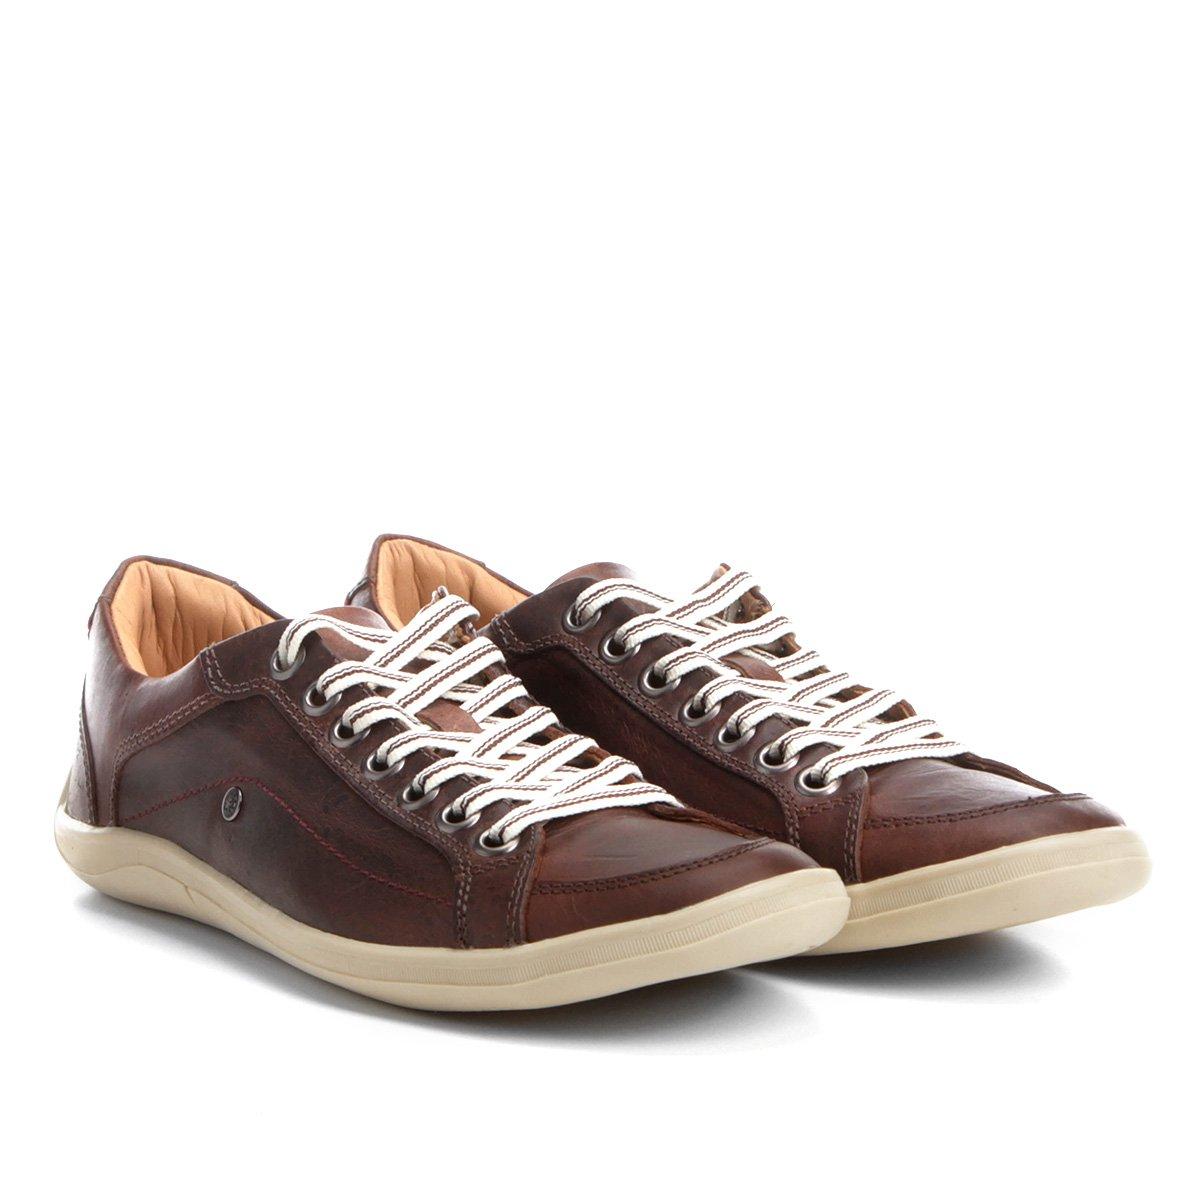 20d2a8cff9 Sapatênis Couro Shoestock Lixado Masculino